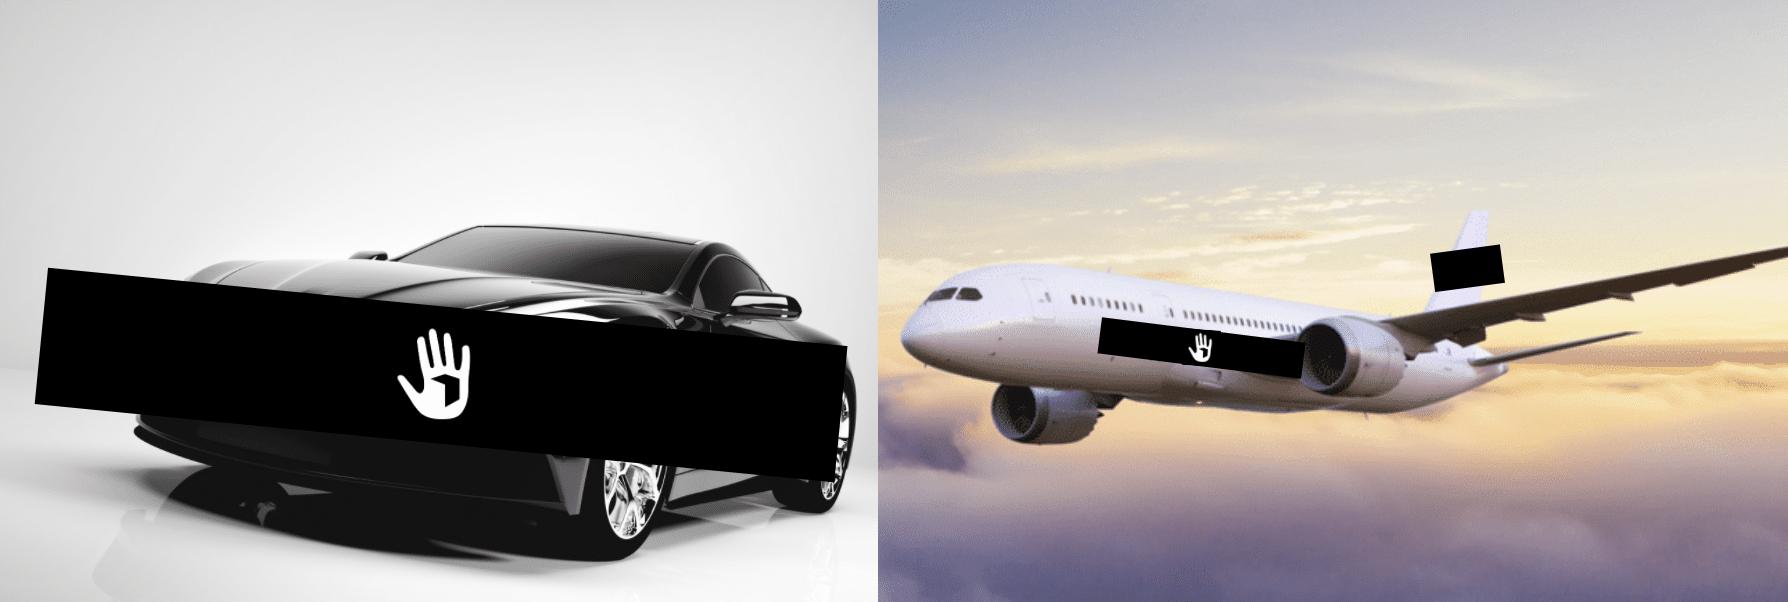 subpac aviation and auto